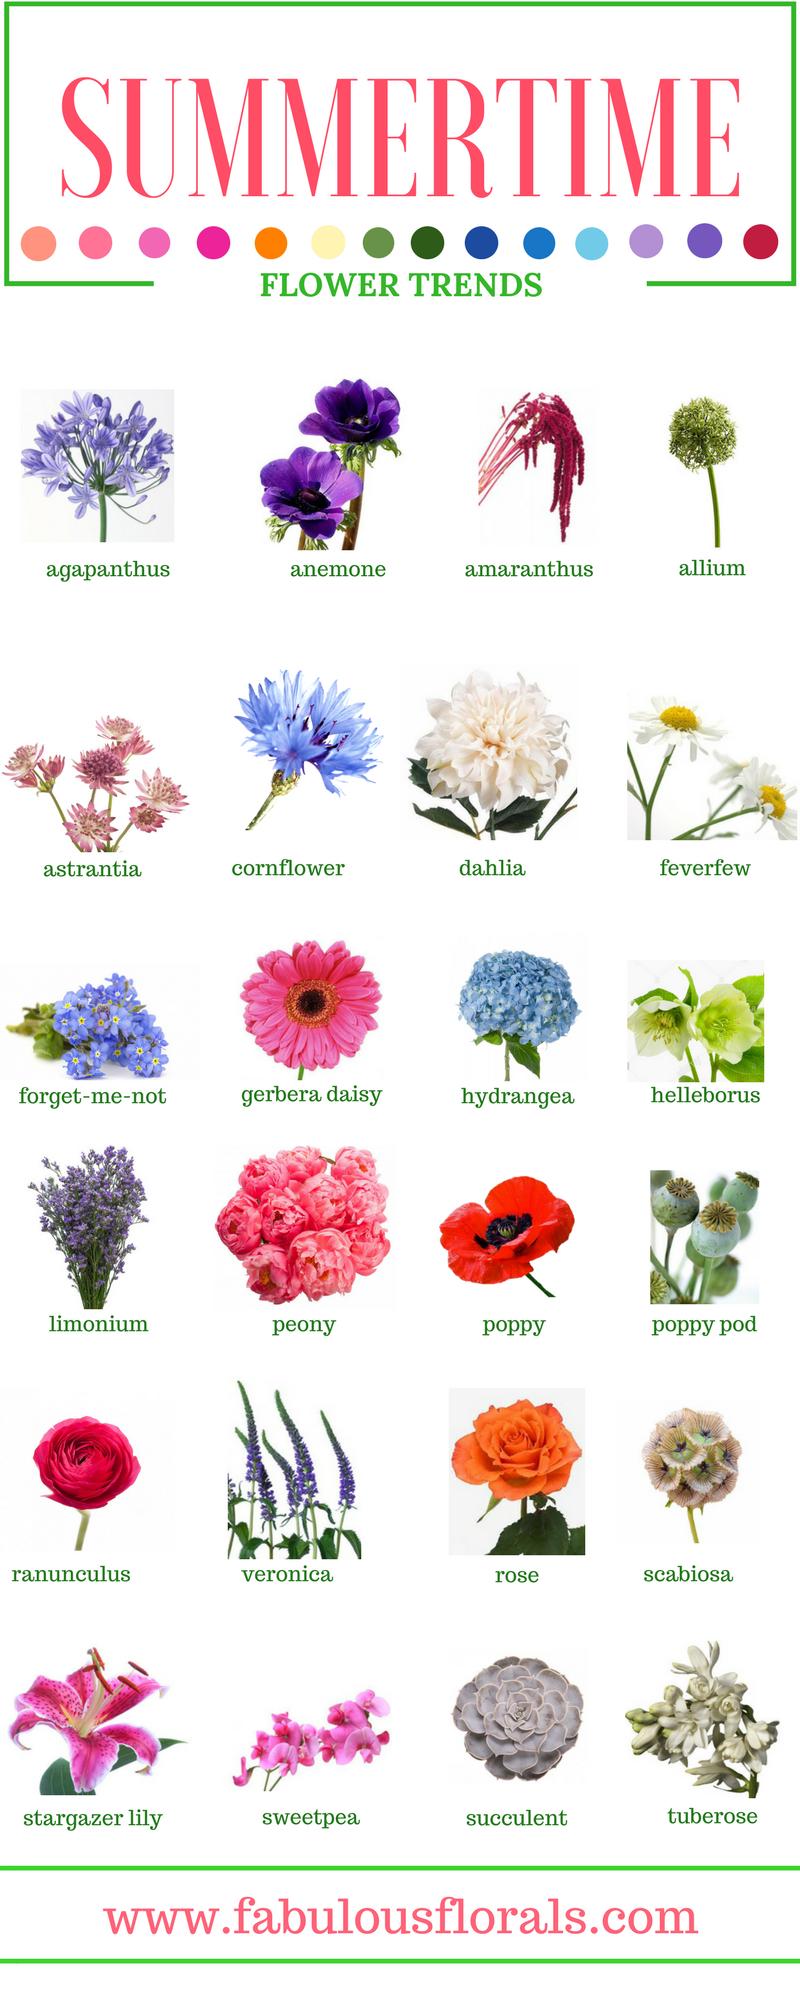 SUMMER FLOWERS Names of the best Summer flowers wedding